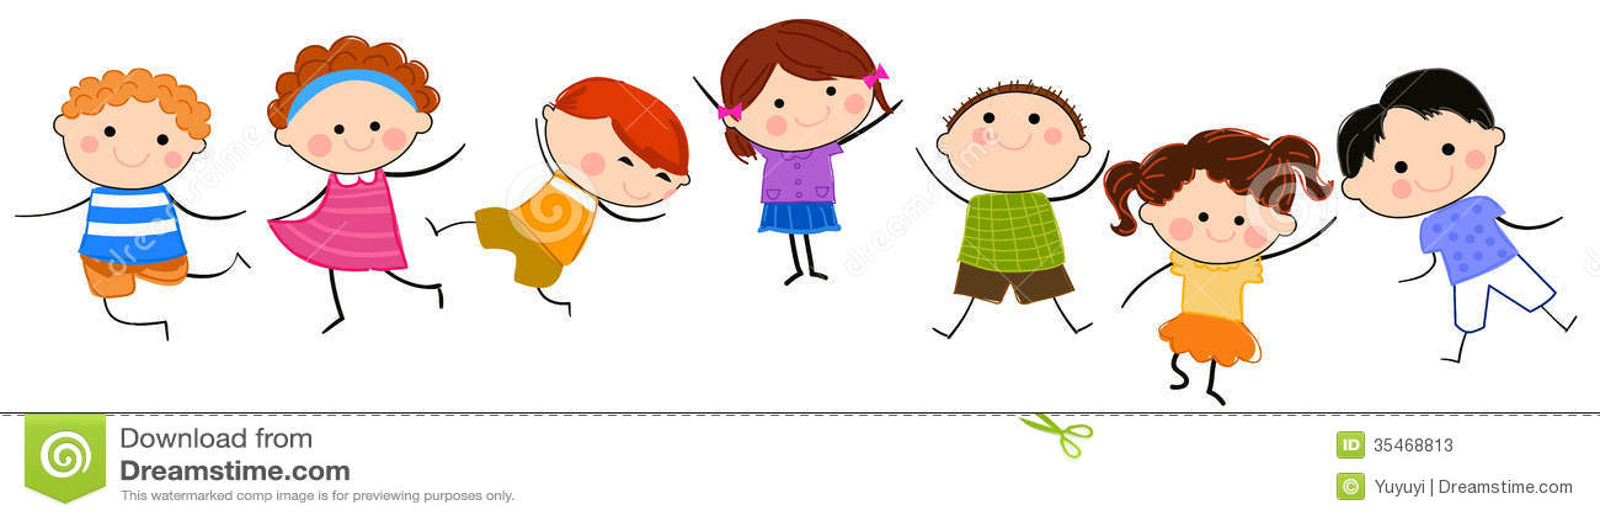 Group Of Kids Having Fun Stock Vector Illustration Of Illustration 35468813